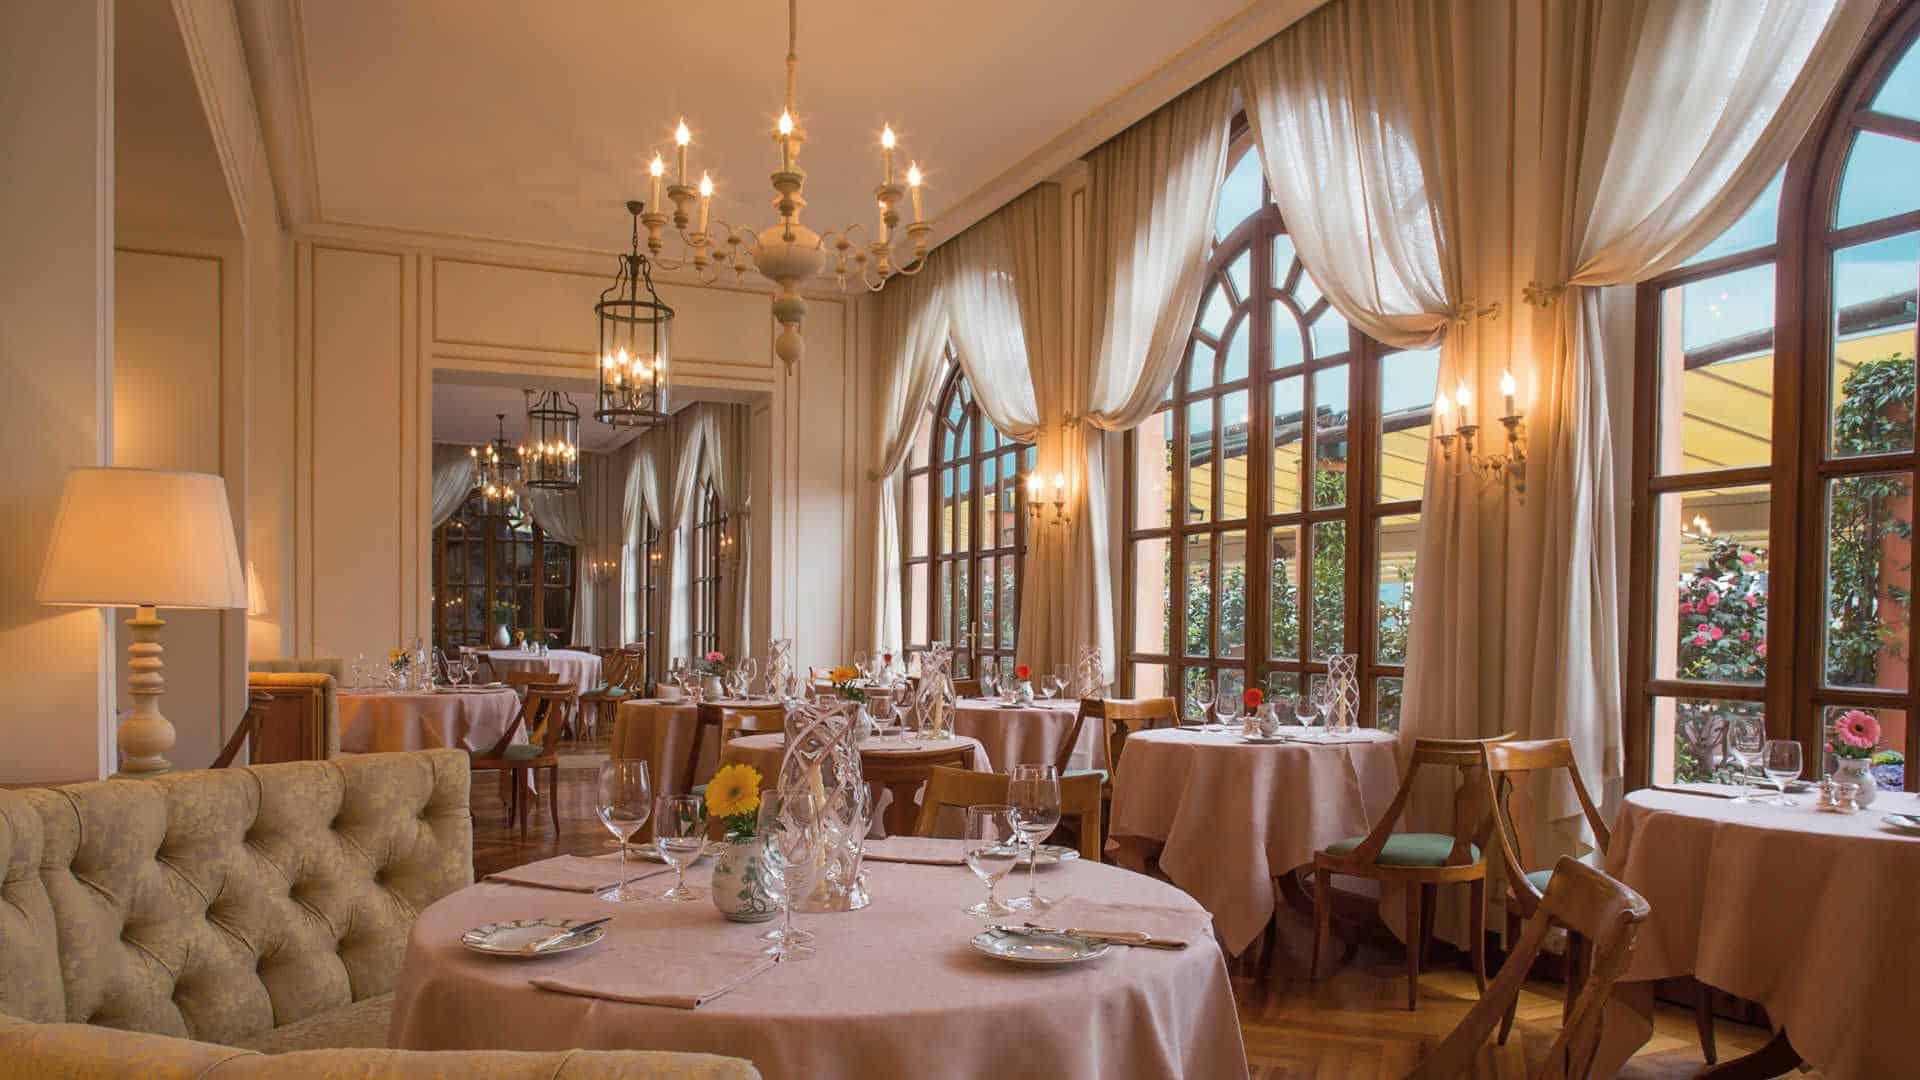 honeymoon top 10 European resorts Belmond Hotel Splendido in Italy